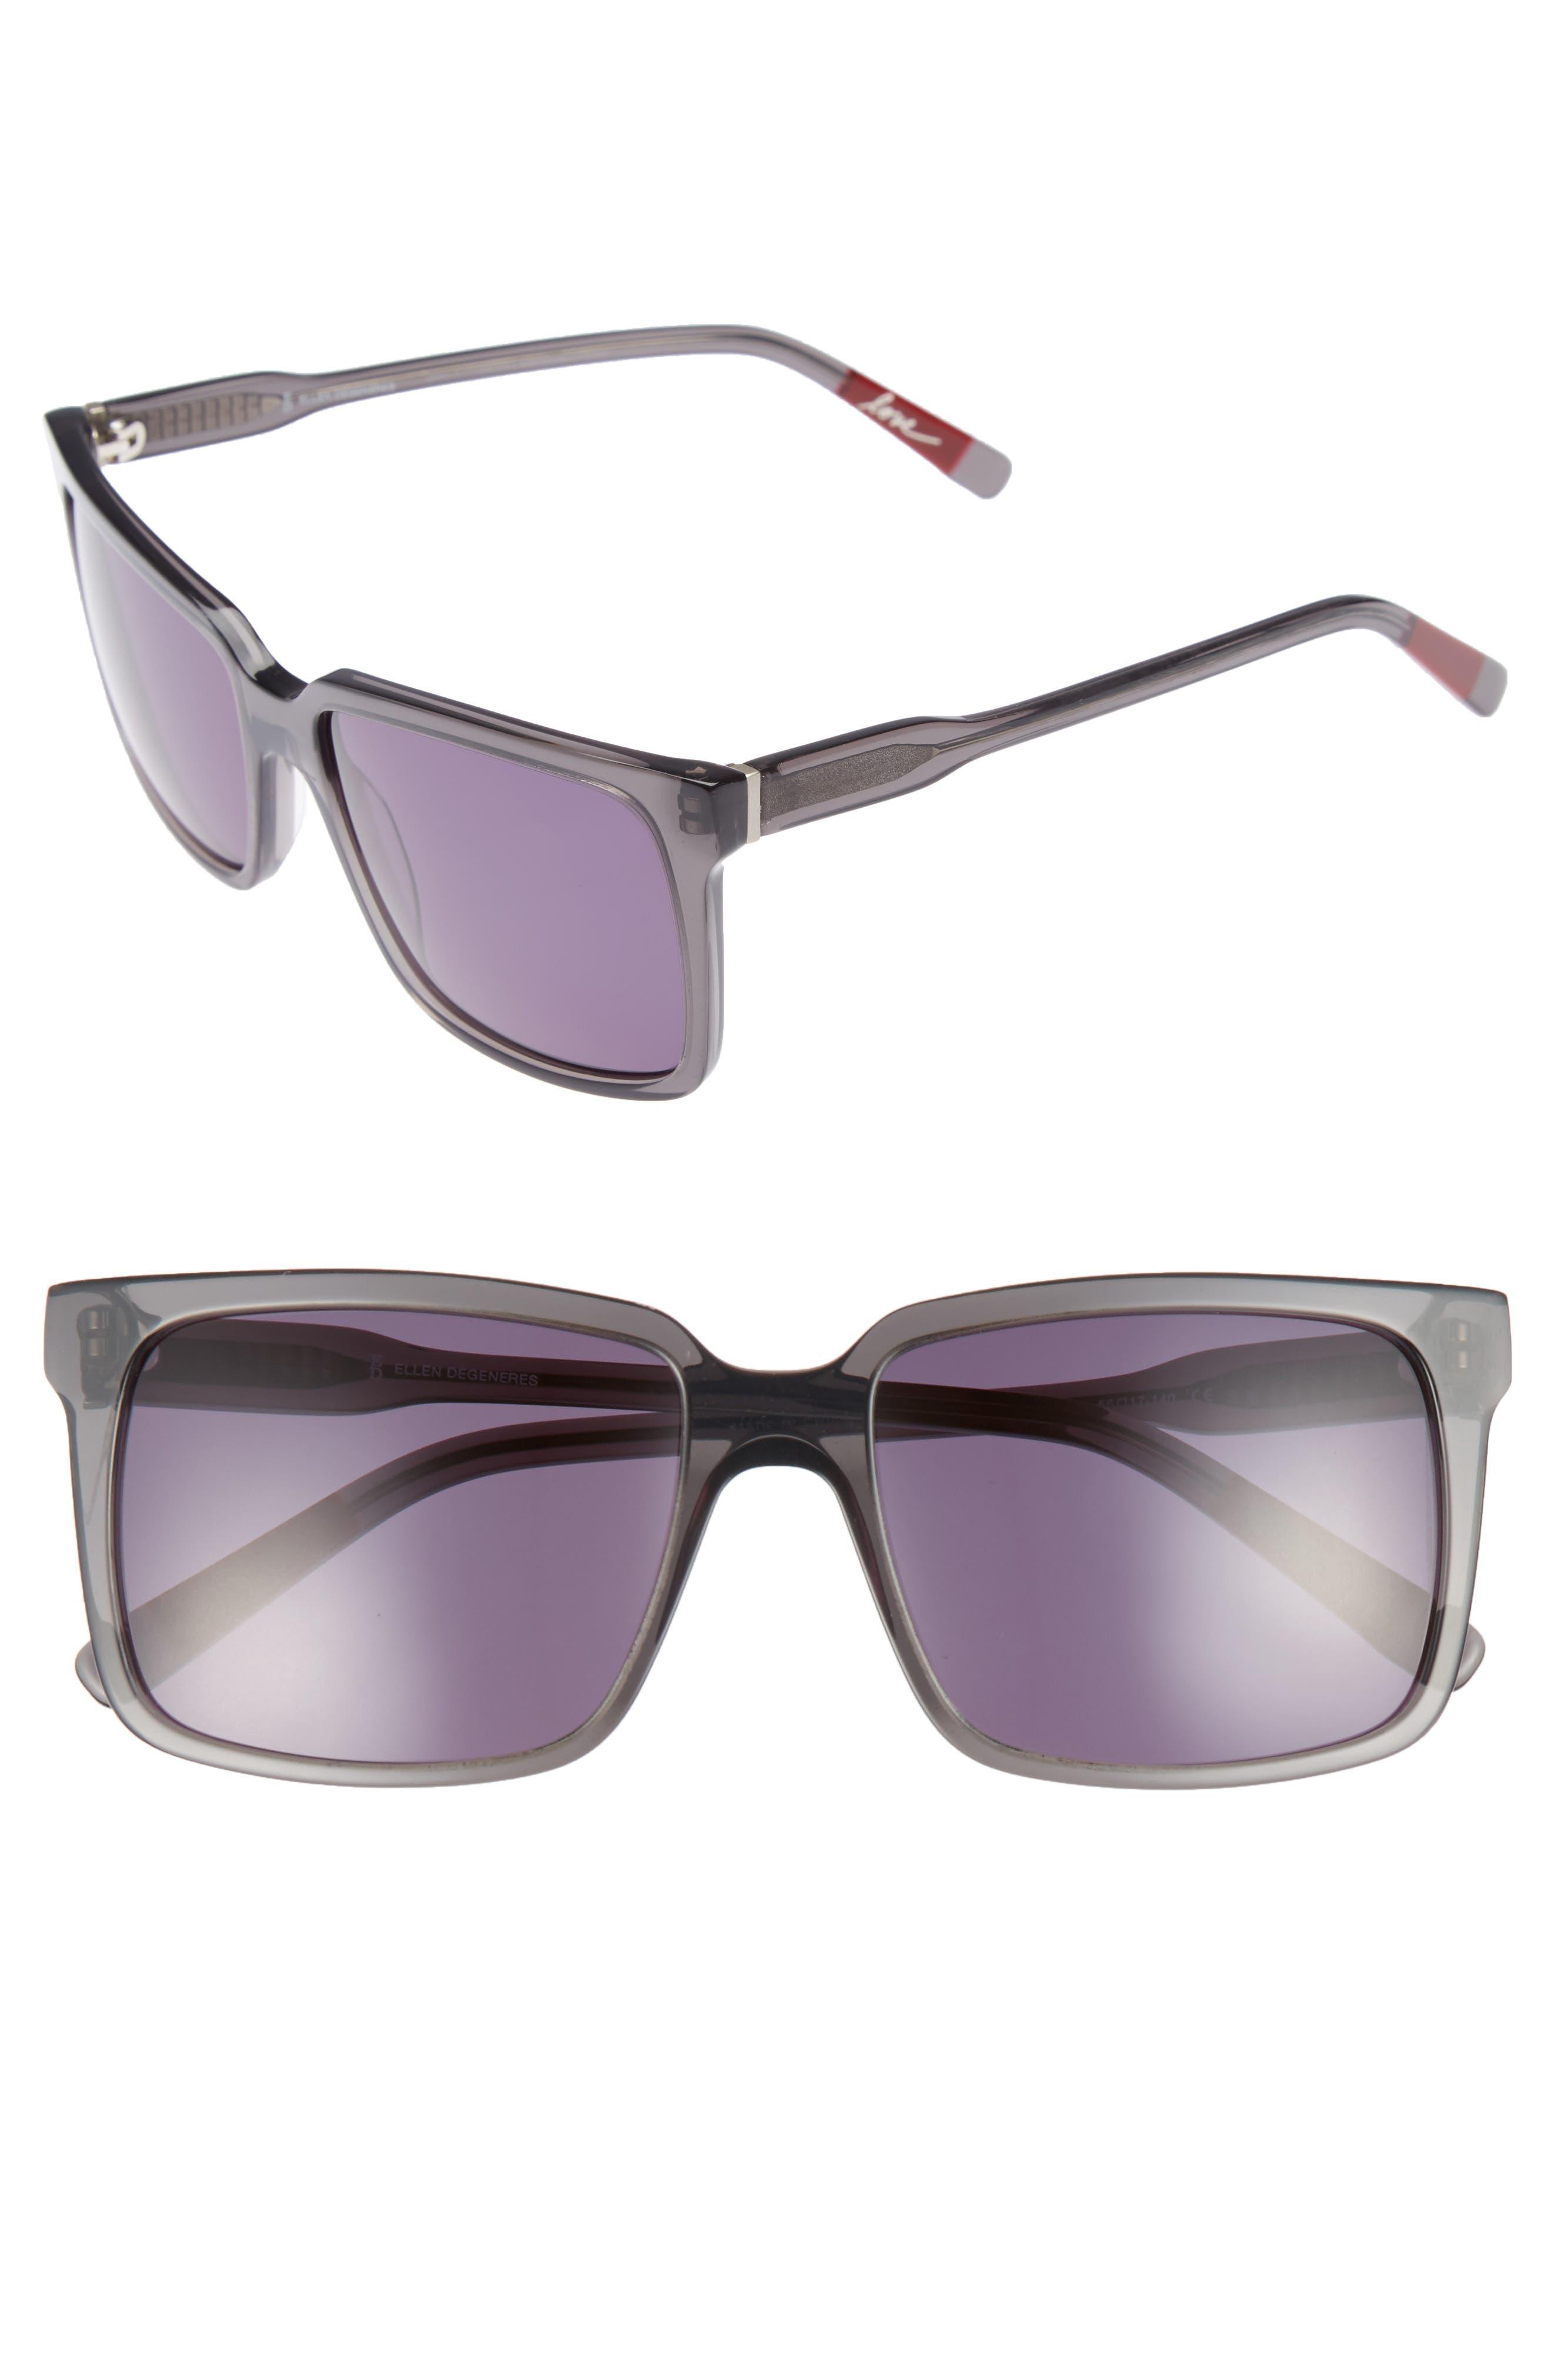 56mm Gradient Square Sunglasses,                             Main thumbnail 1, color,                             DARK GREY